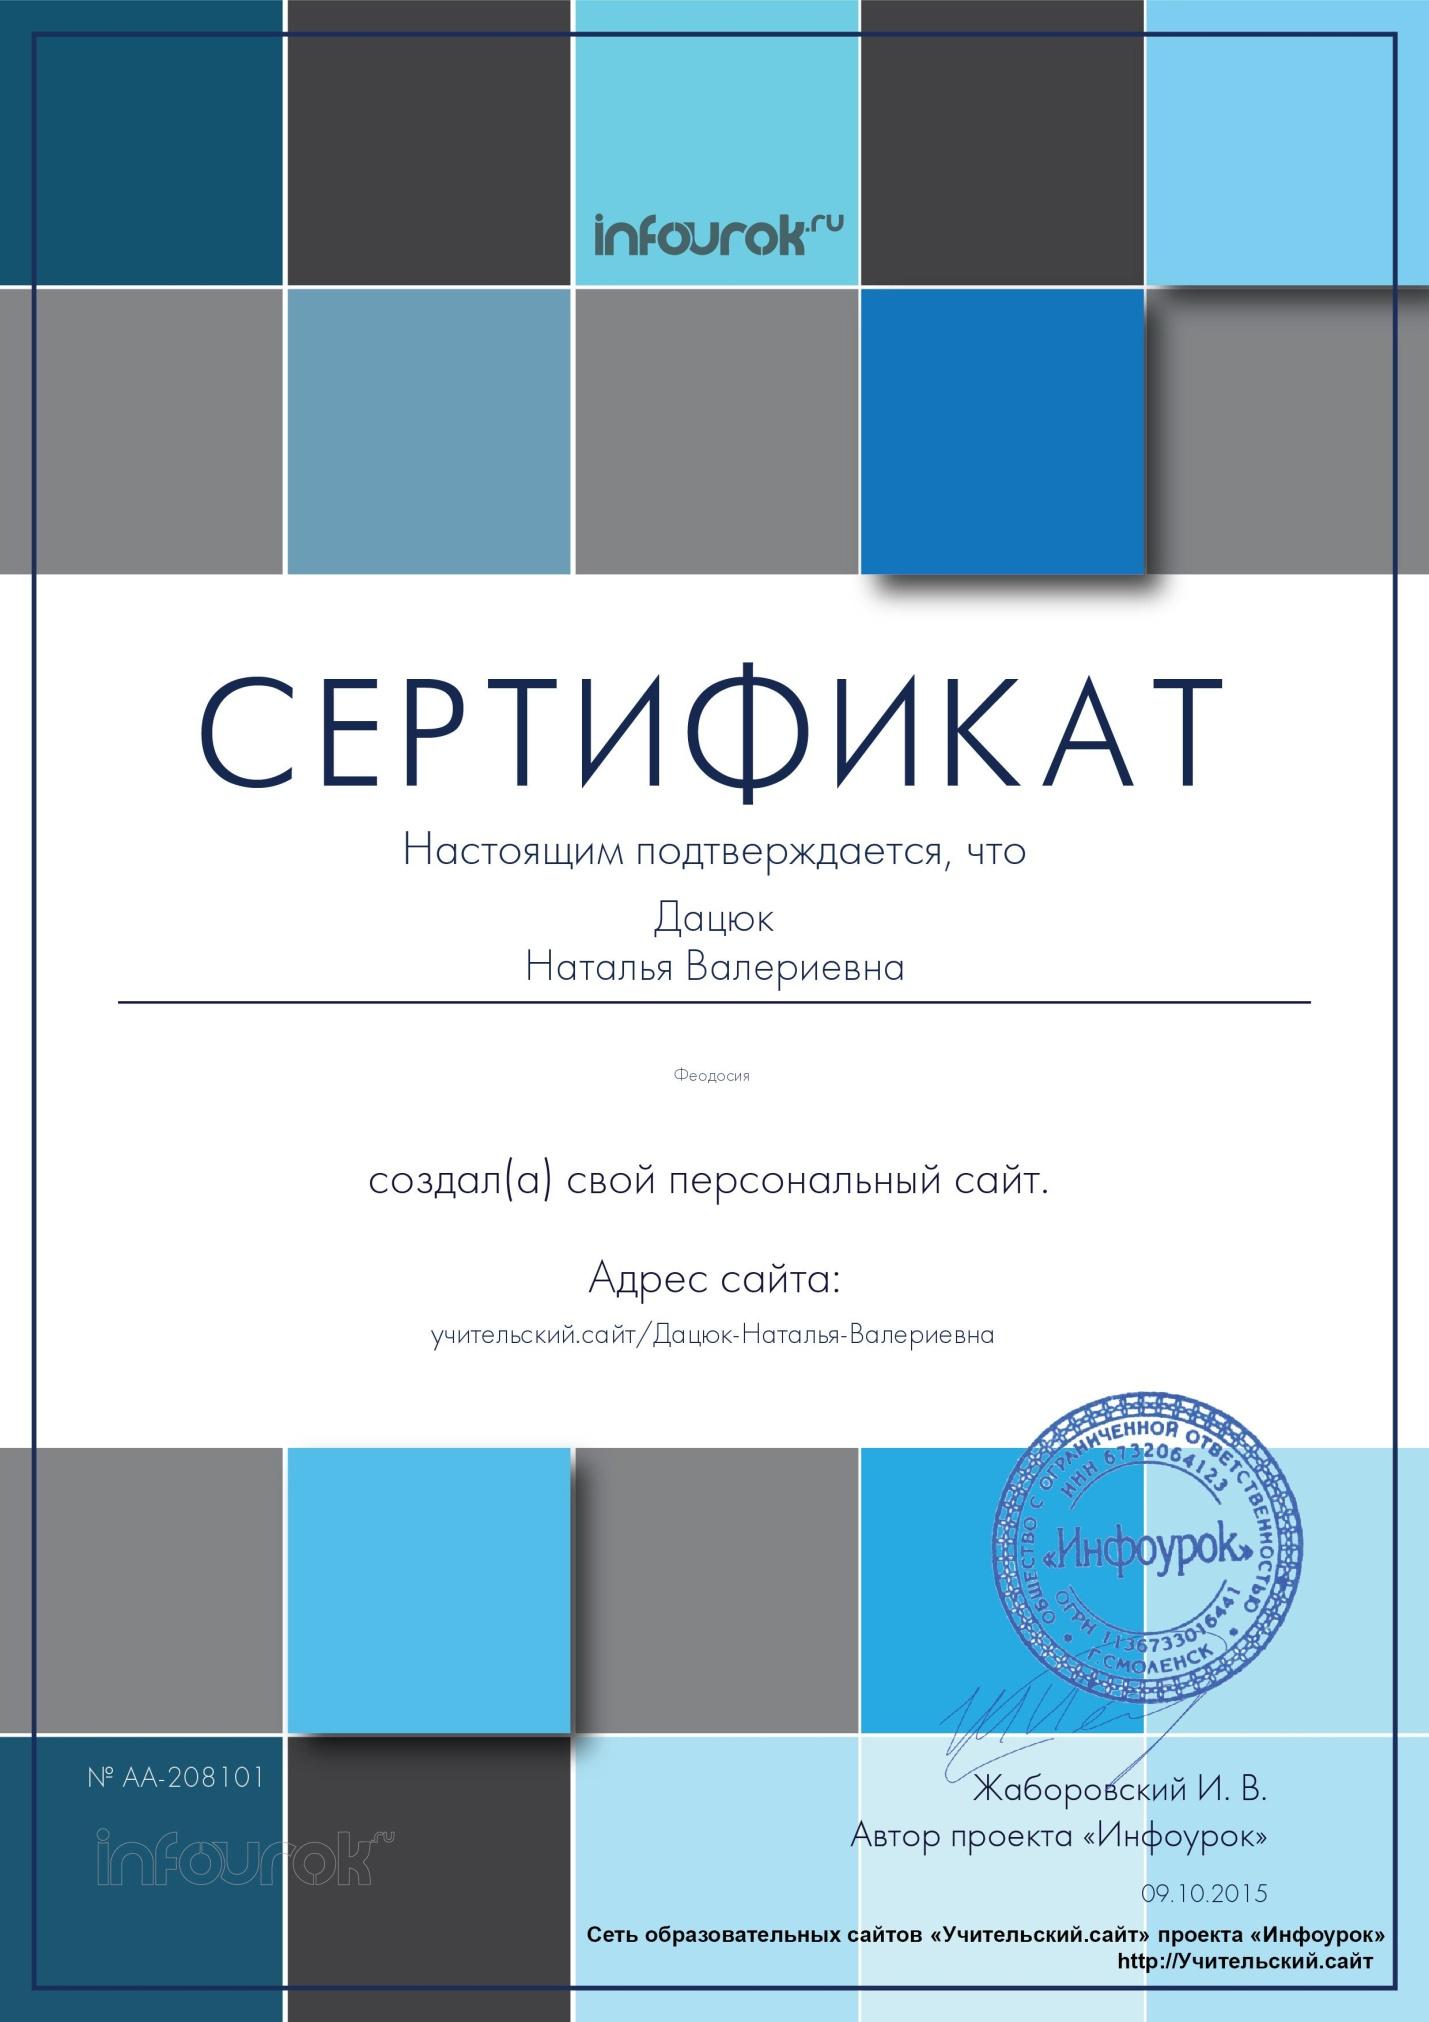 C:\Users\COMPP\Downloads\Сертификат проекта infourok.ru № АA-208101.jpg